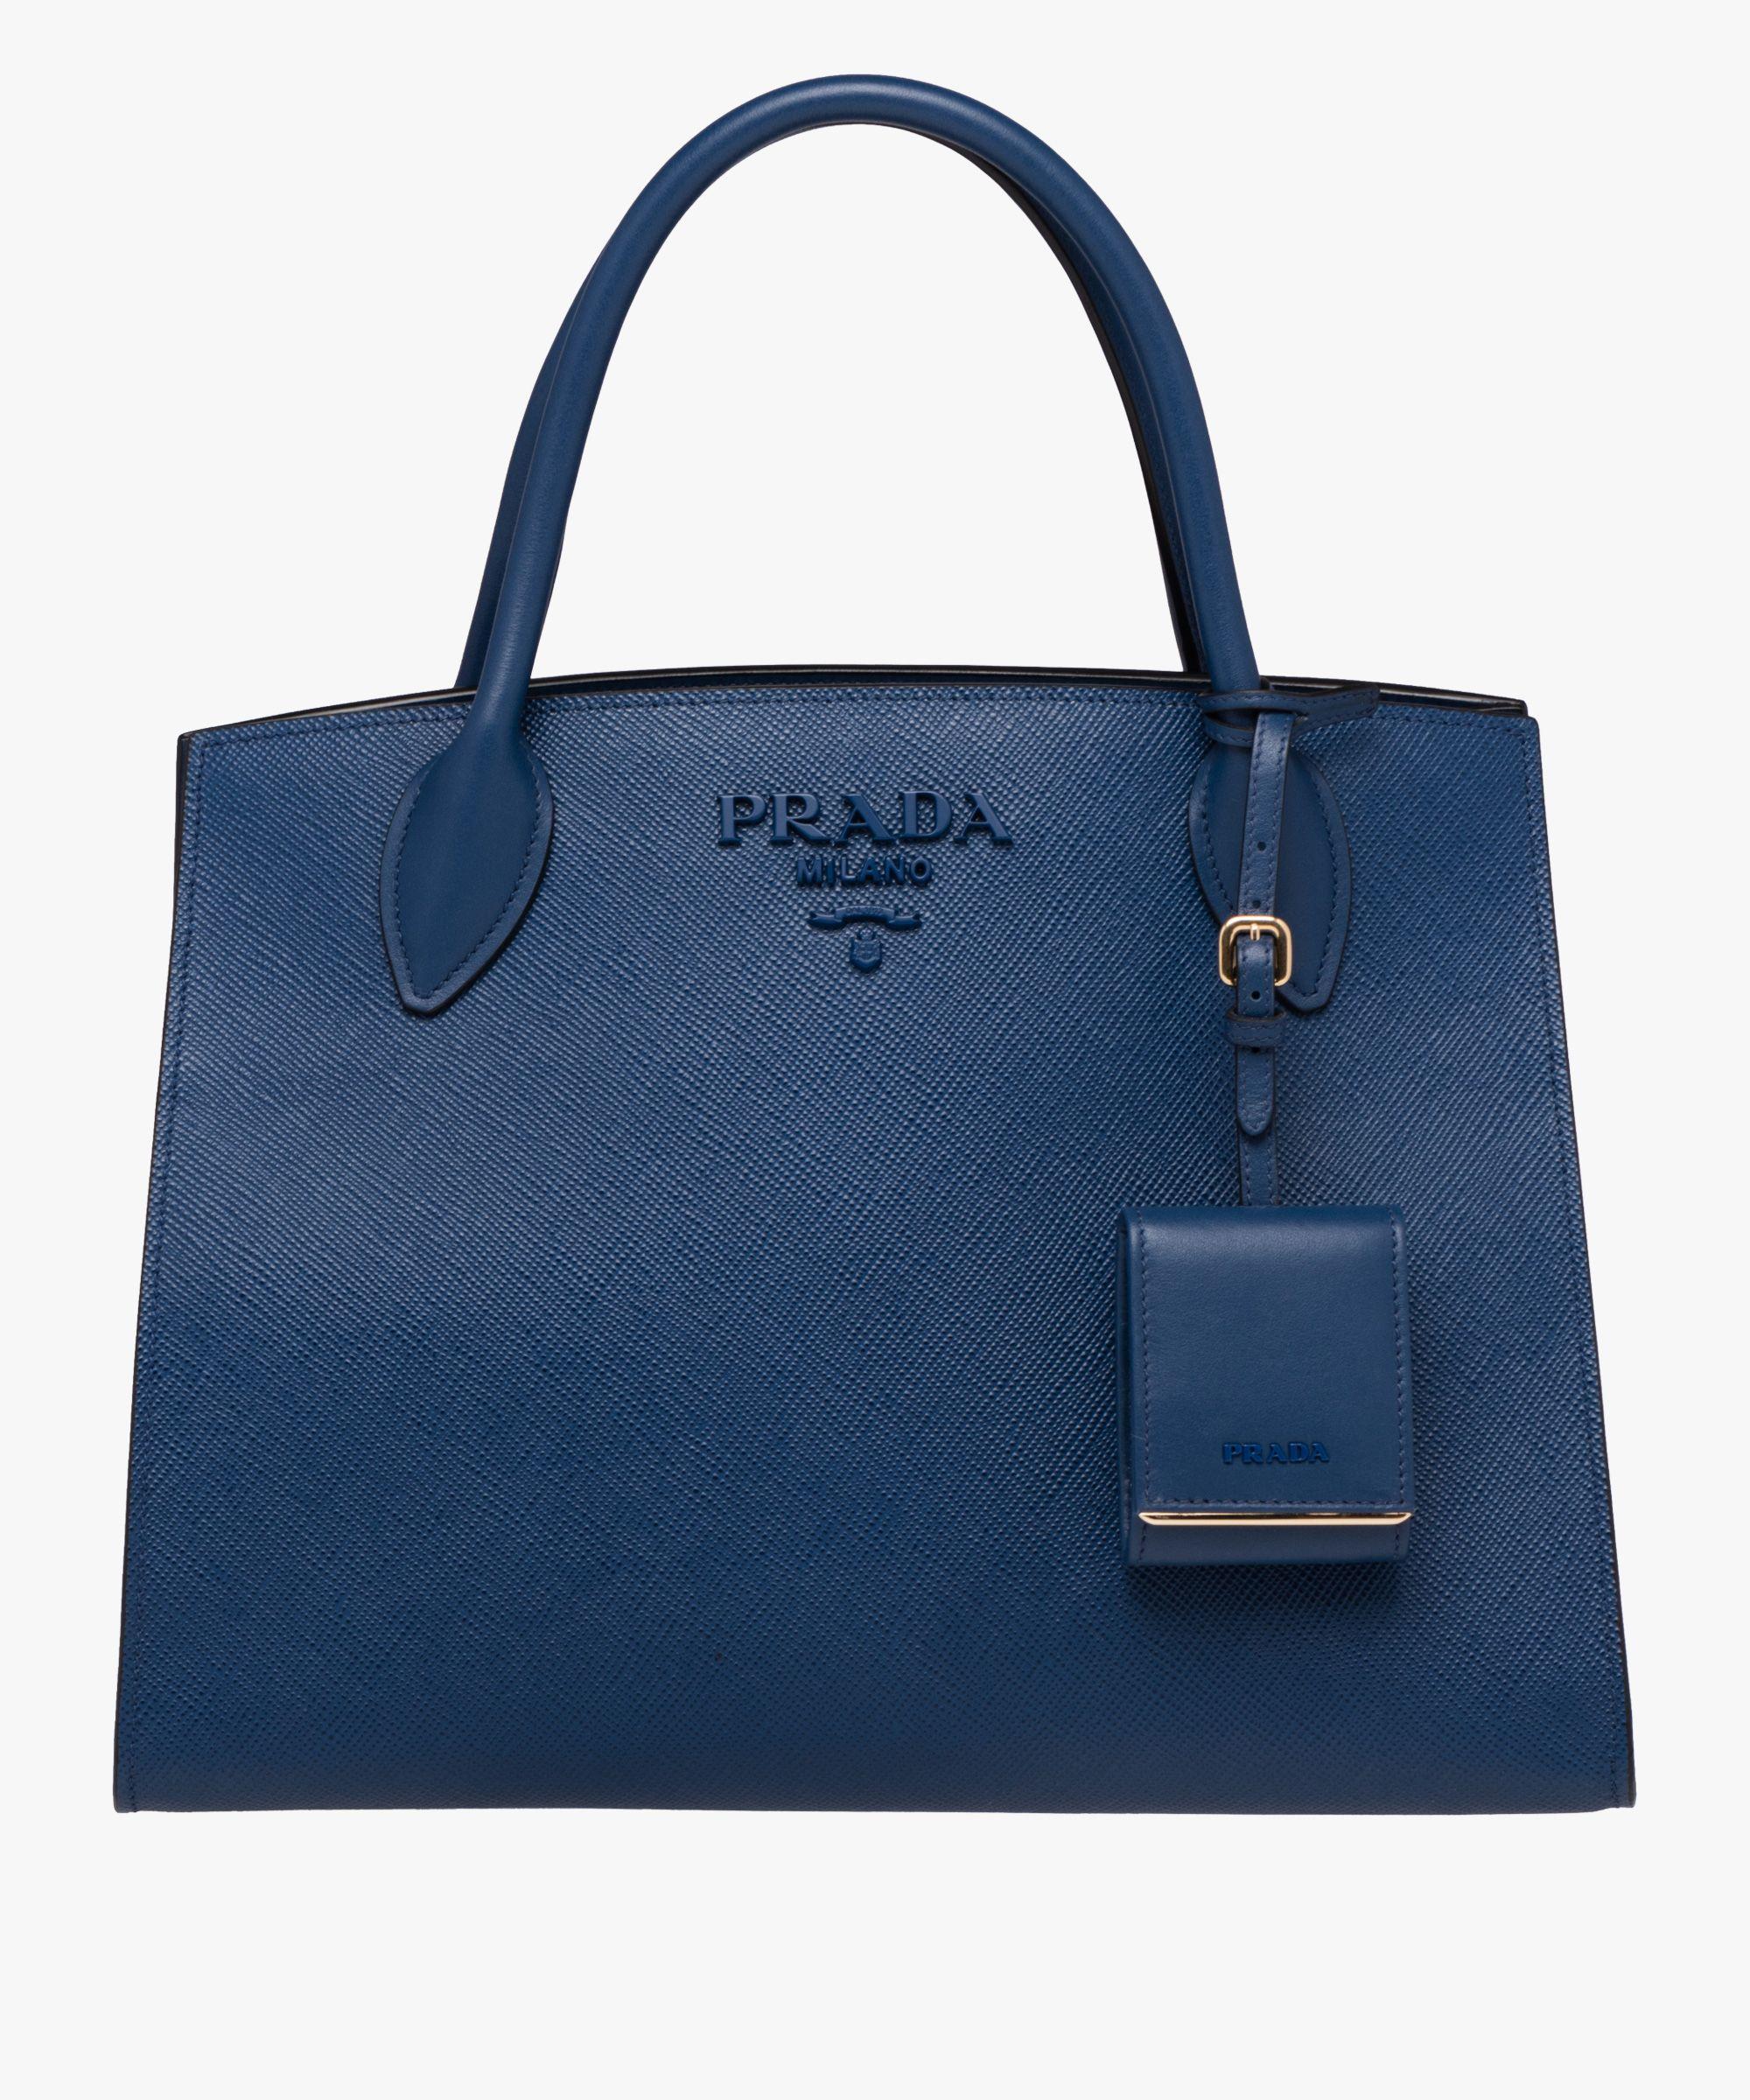 5917ff28ee6 Twin Bag in nylon | Bags | Bags, Prada bag, Women